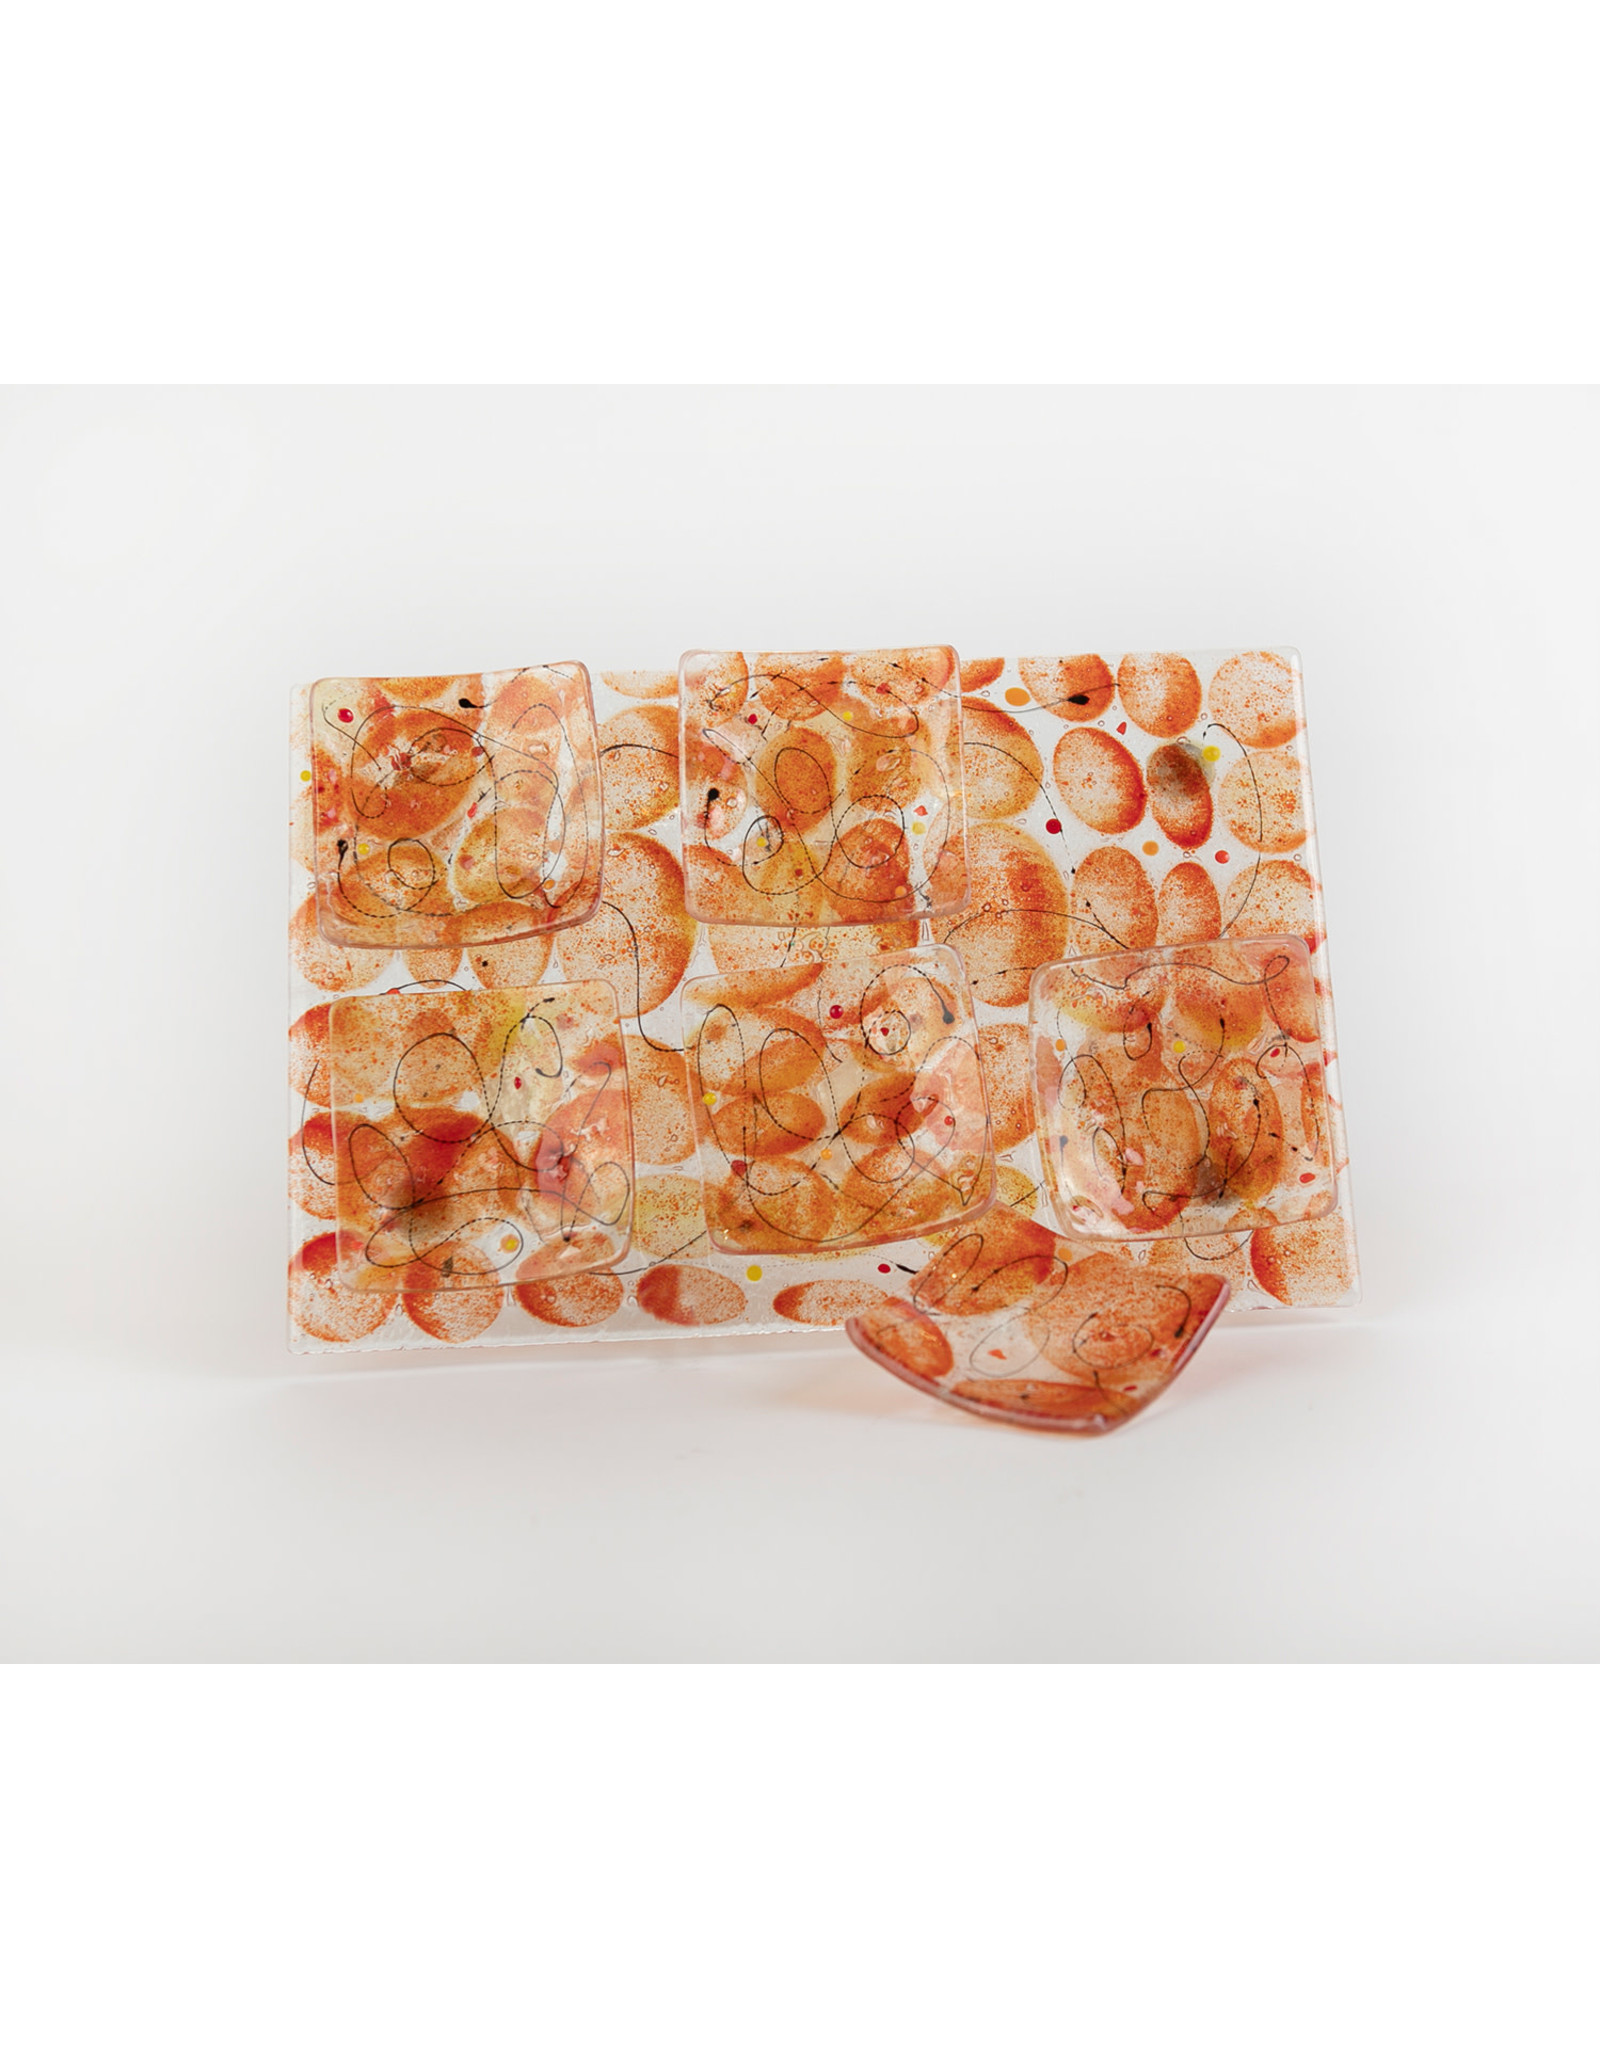 Seder Plate Orange Glass Artisannal